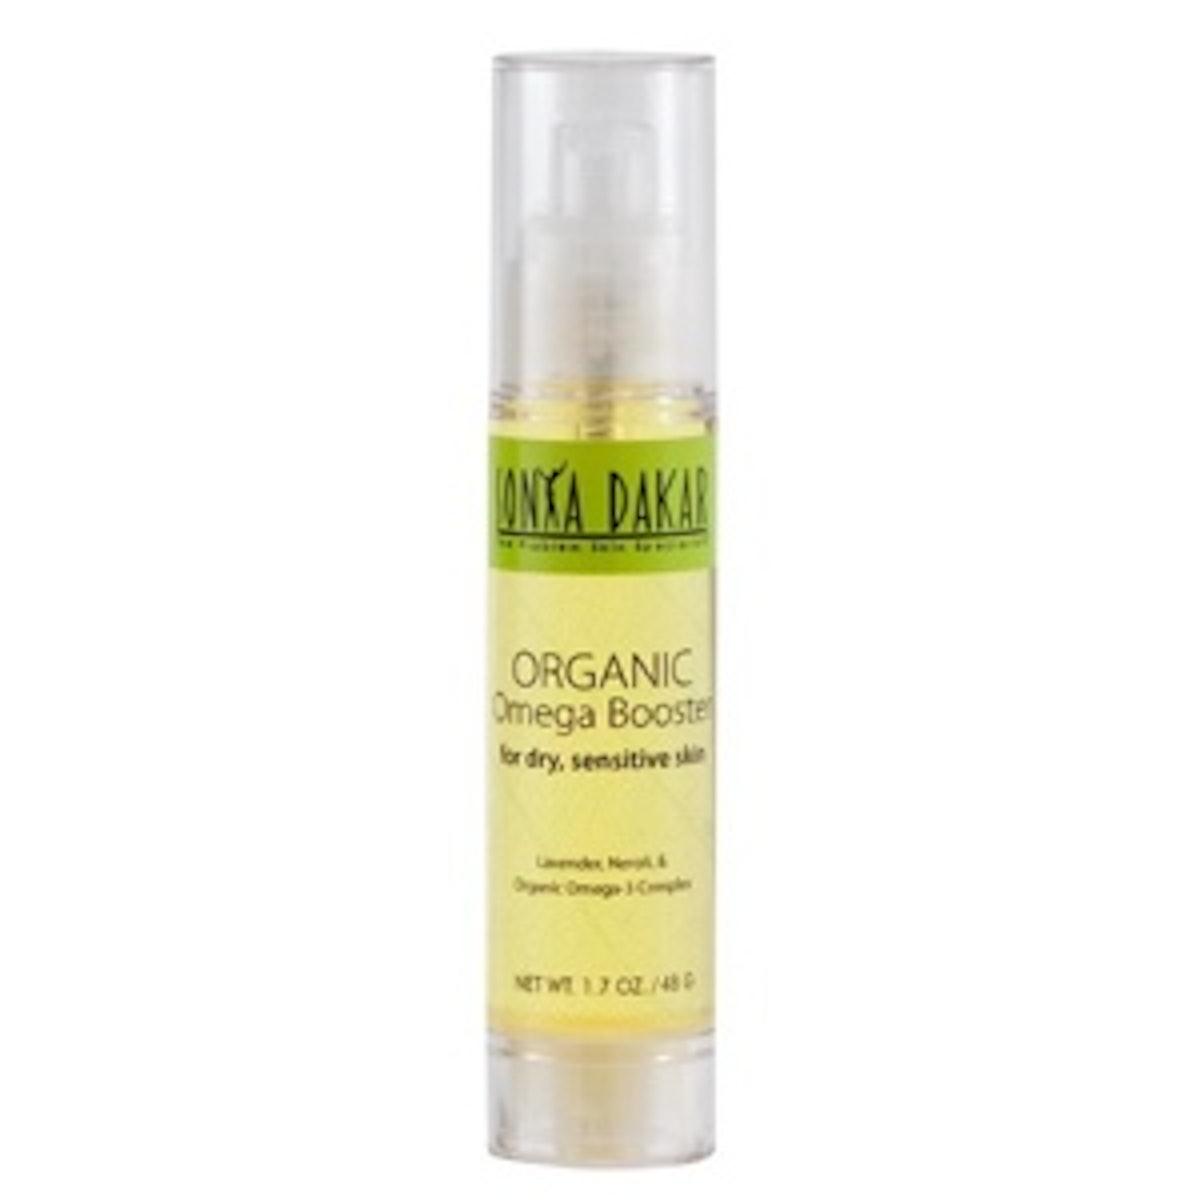 Organic Omega Booster